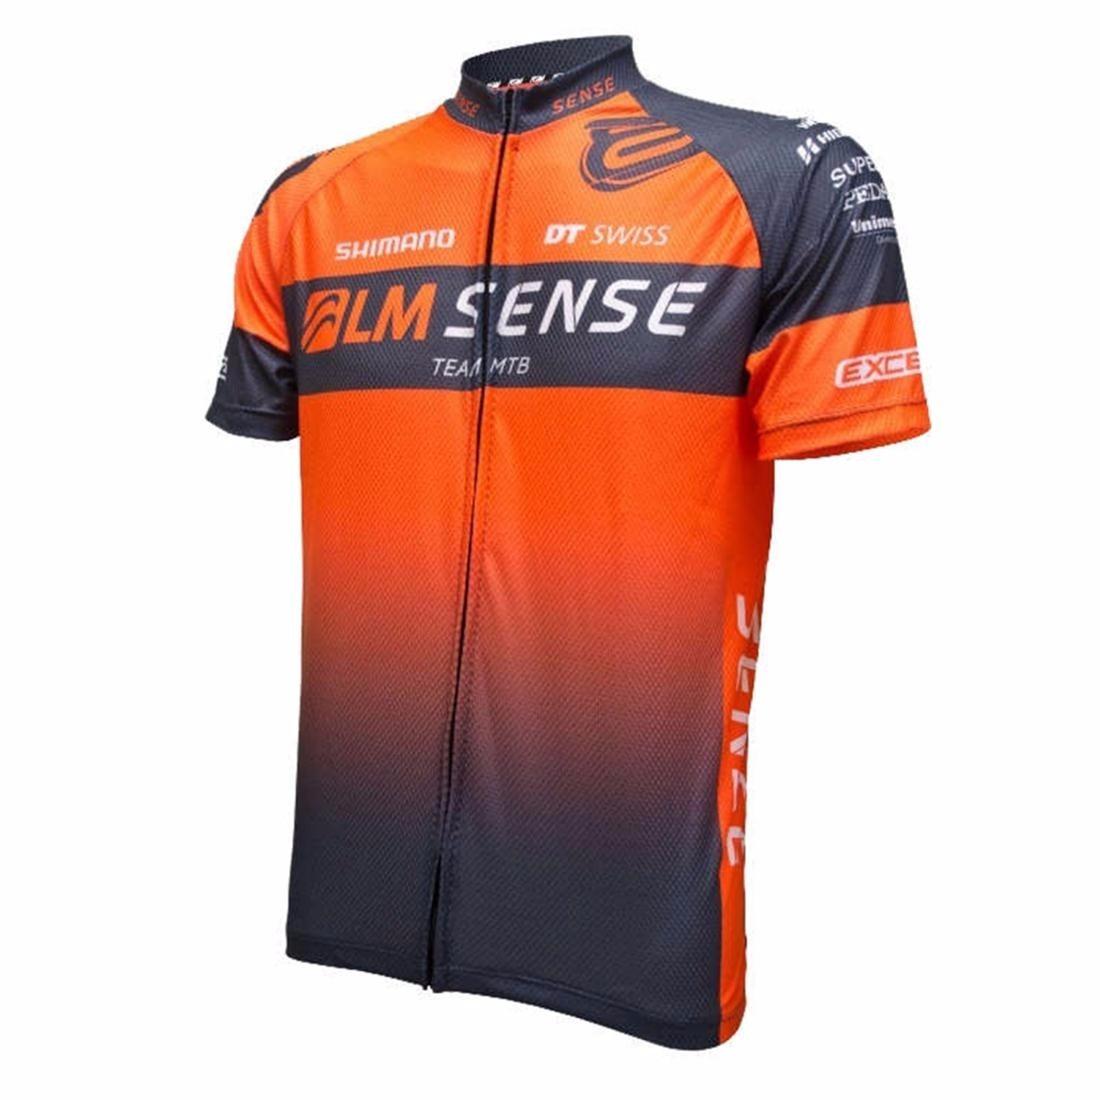 Camisa Ciclismo Asw Sense Fun Cinza Laranja M - R  139 fcd080745ff82